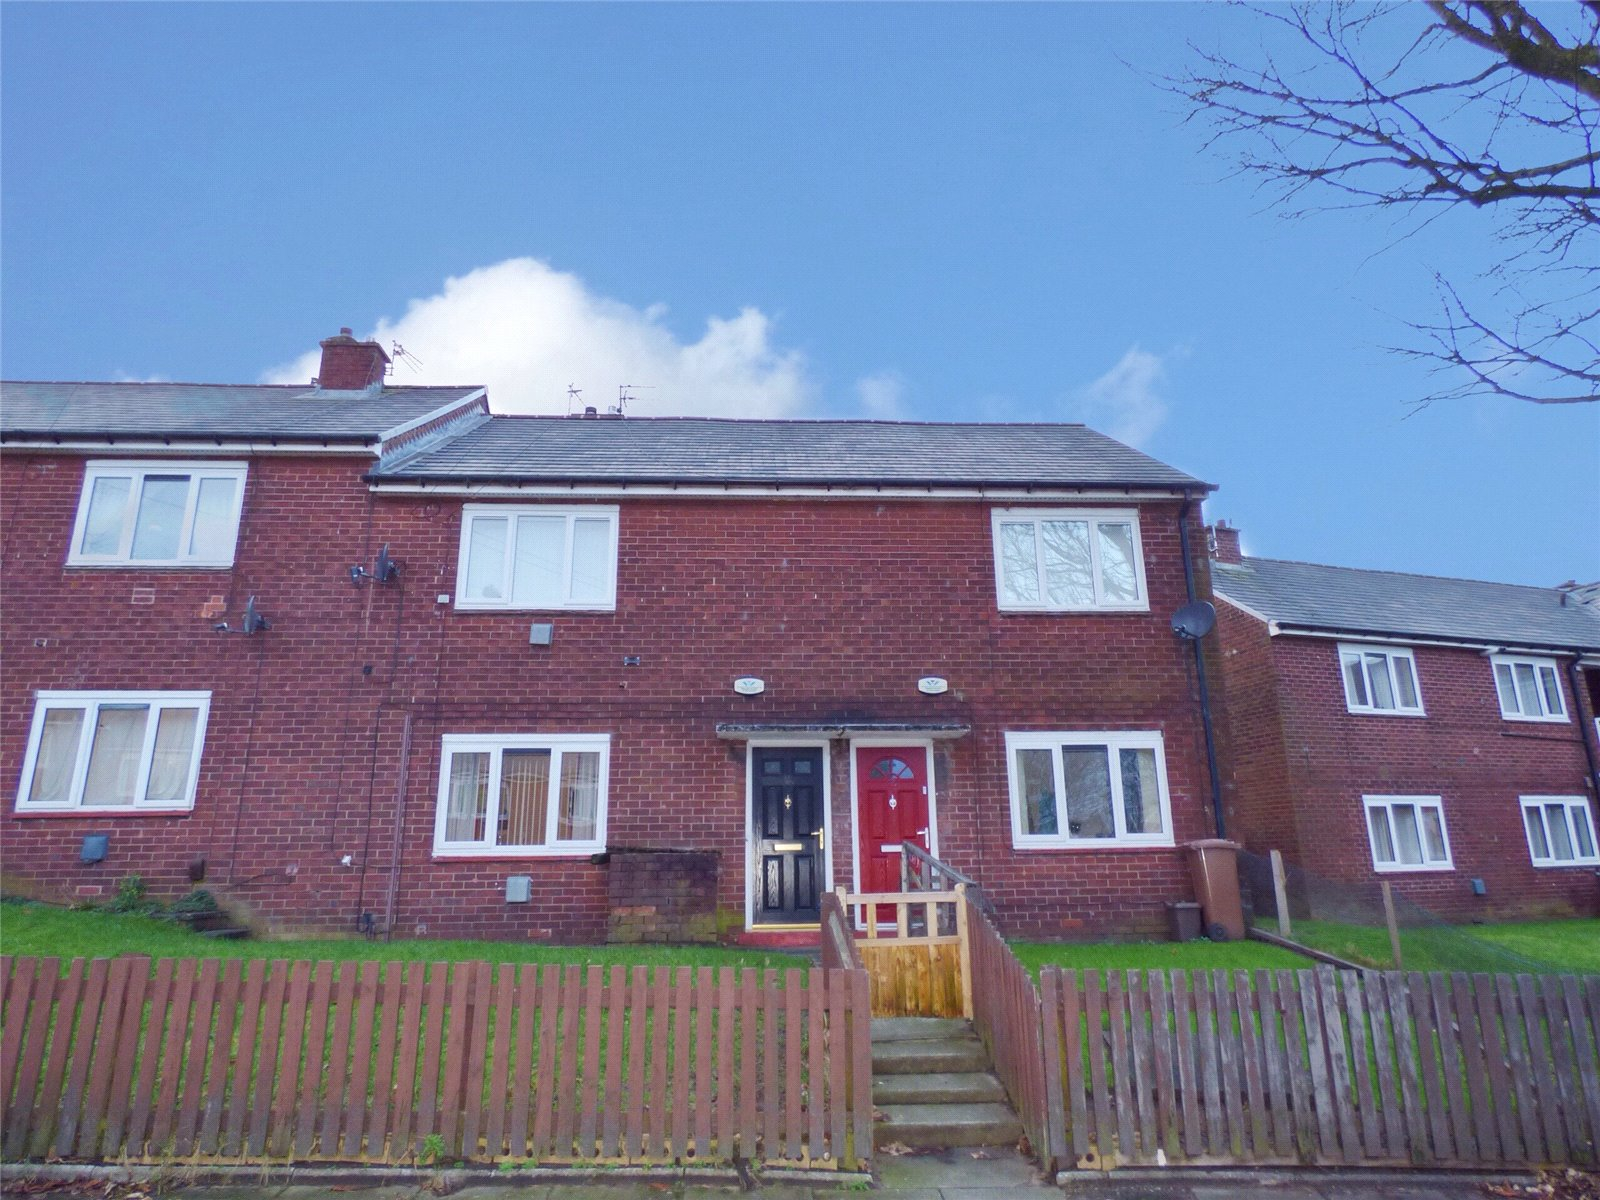 2 Bedrooms Maisonette Flat for sale in Downham Road, Heywood, Greater Manchester, OL10